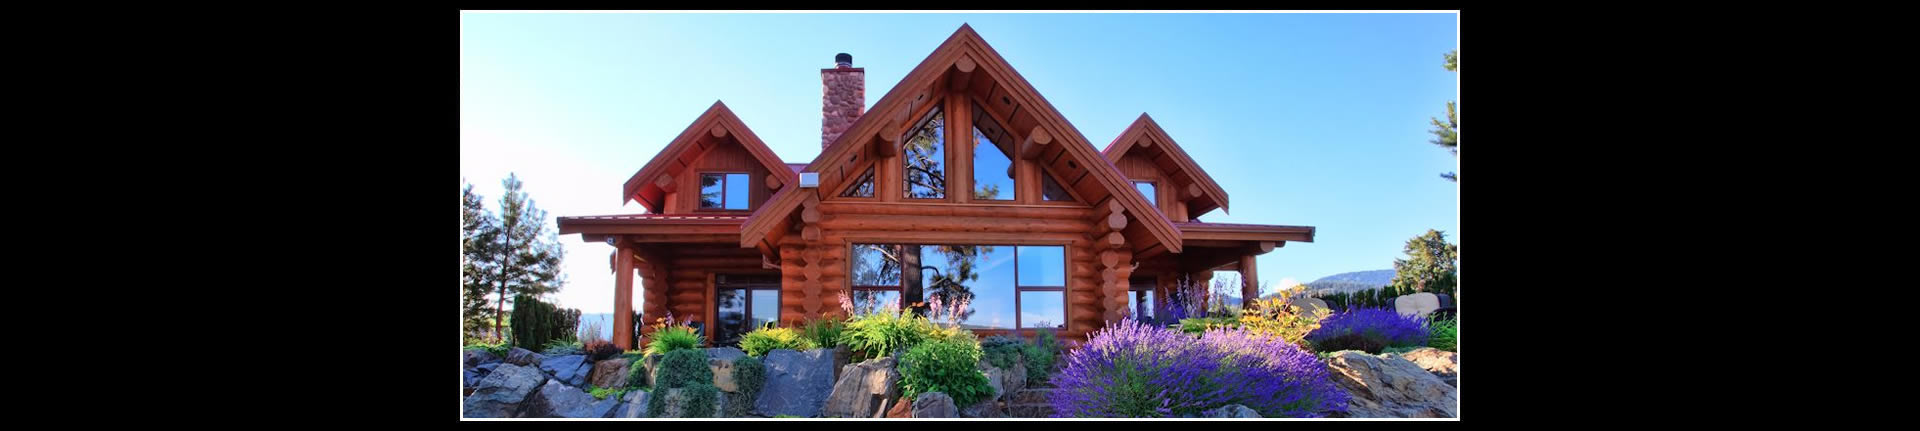 Slider_Image_log-lake-cabin